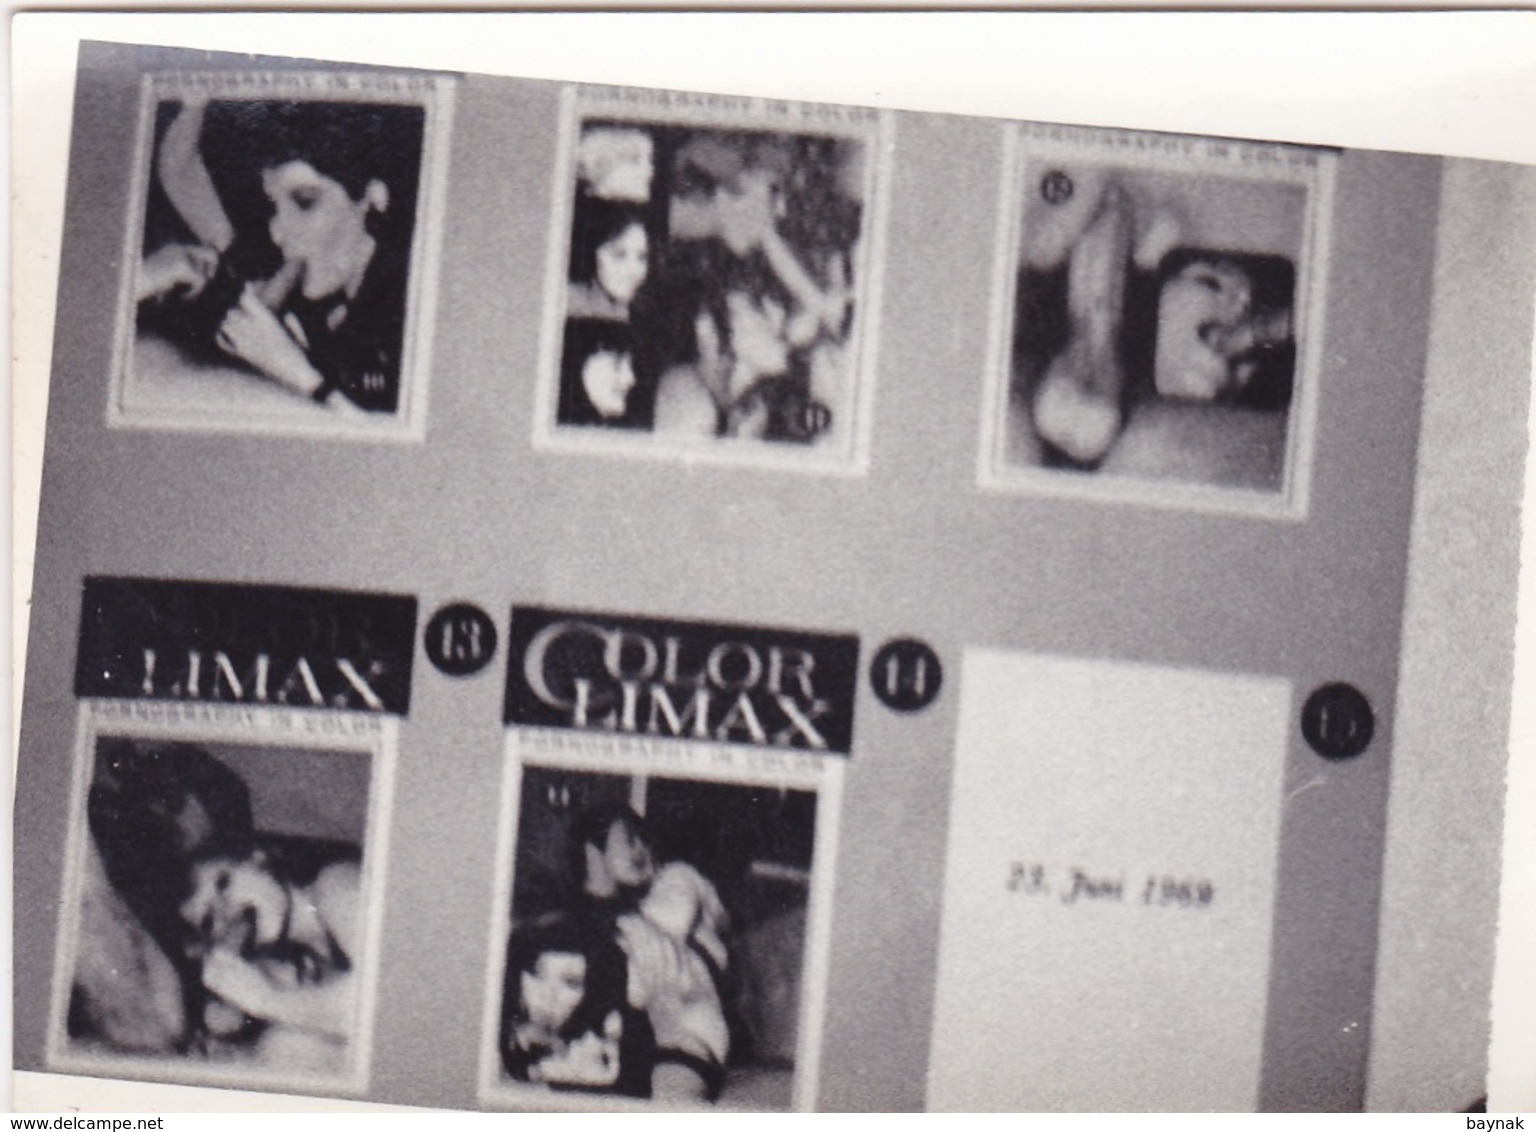 1949  --  FOTO EROTIC, NUDE   --  9 Cm X 6,5 Cm   --    1500 EROTISCHES  PHOTOS IN MEIN SHOP - Belleza Feminina (1941-1960)